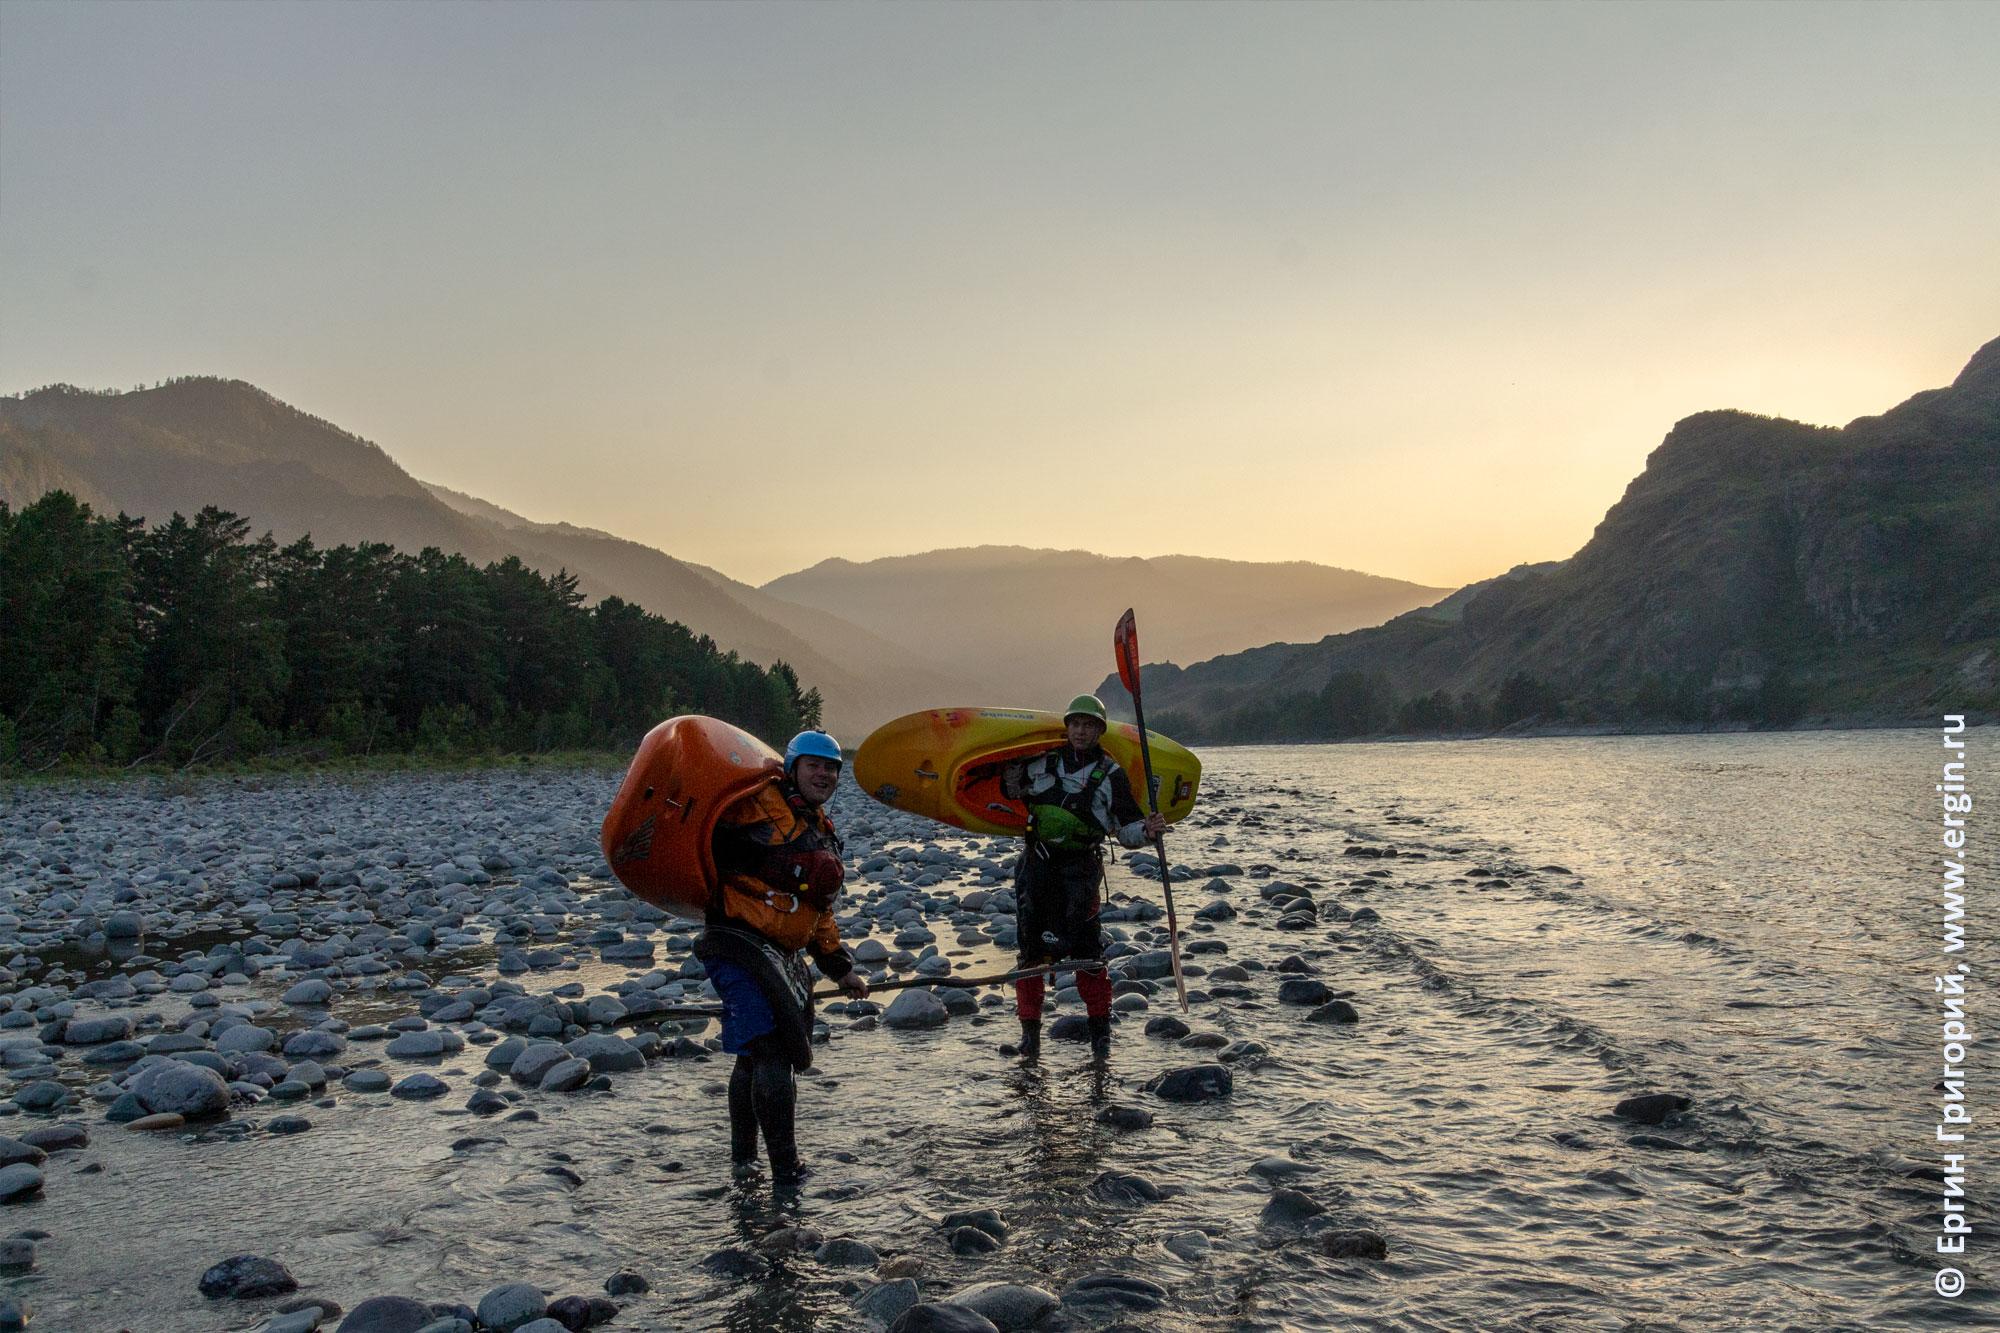 Завершение одного из дней родео-тура на Бийке, закат на Катуни